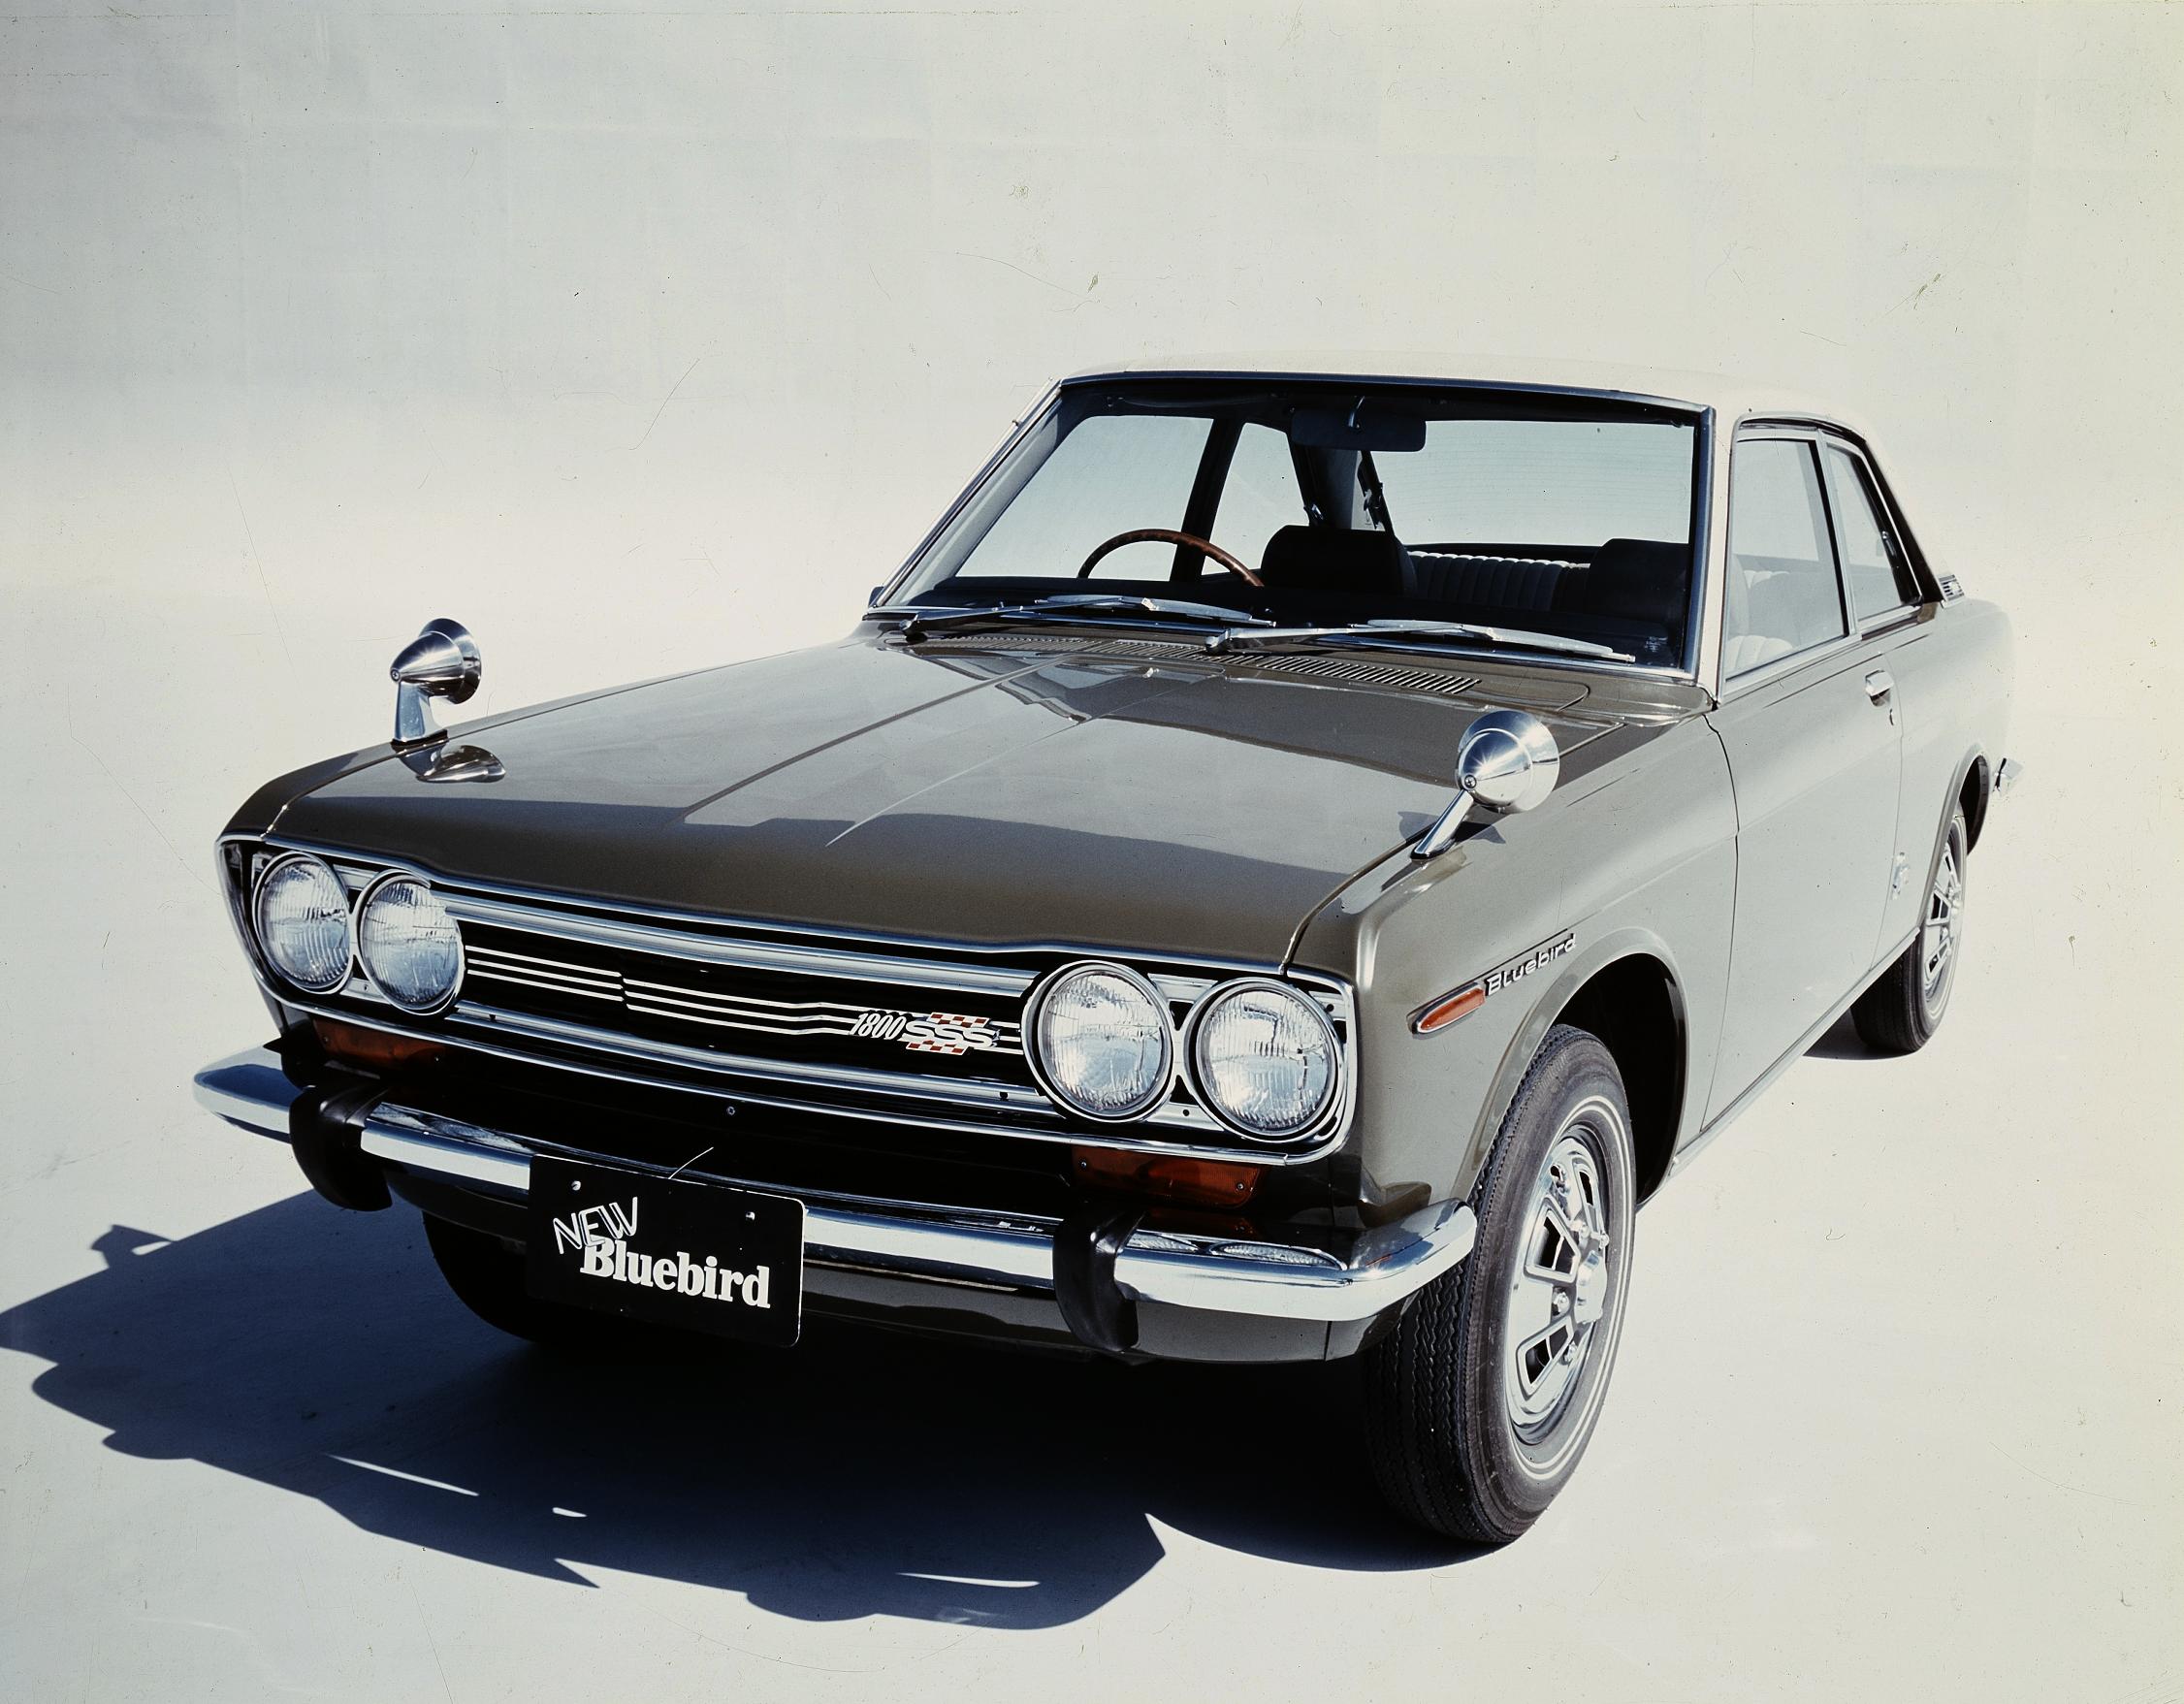 50 Year Club Nissan Bluebird 510 Japanese Nostalgic Car